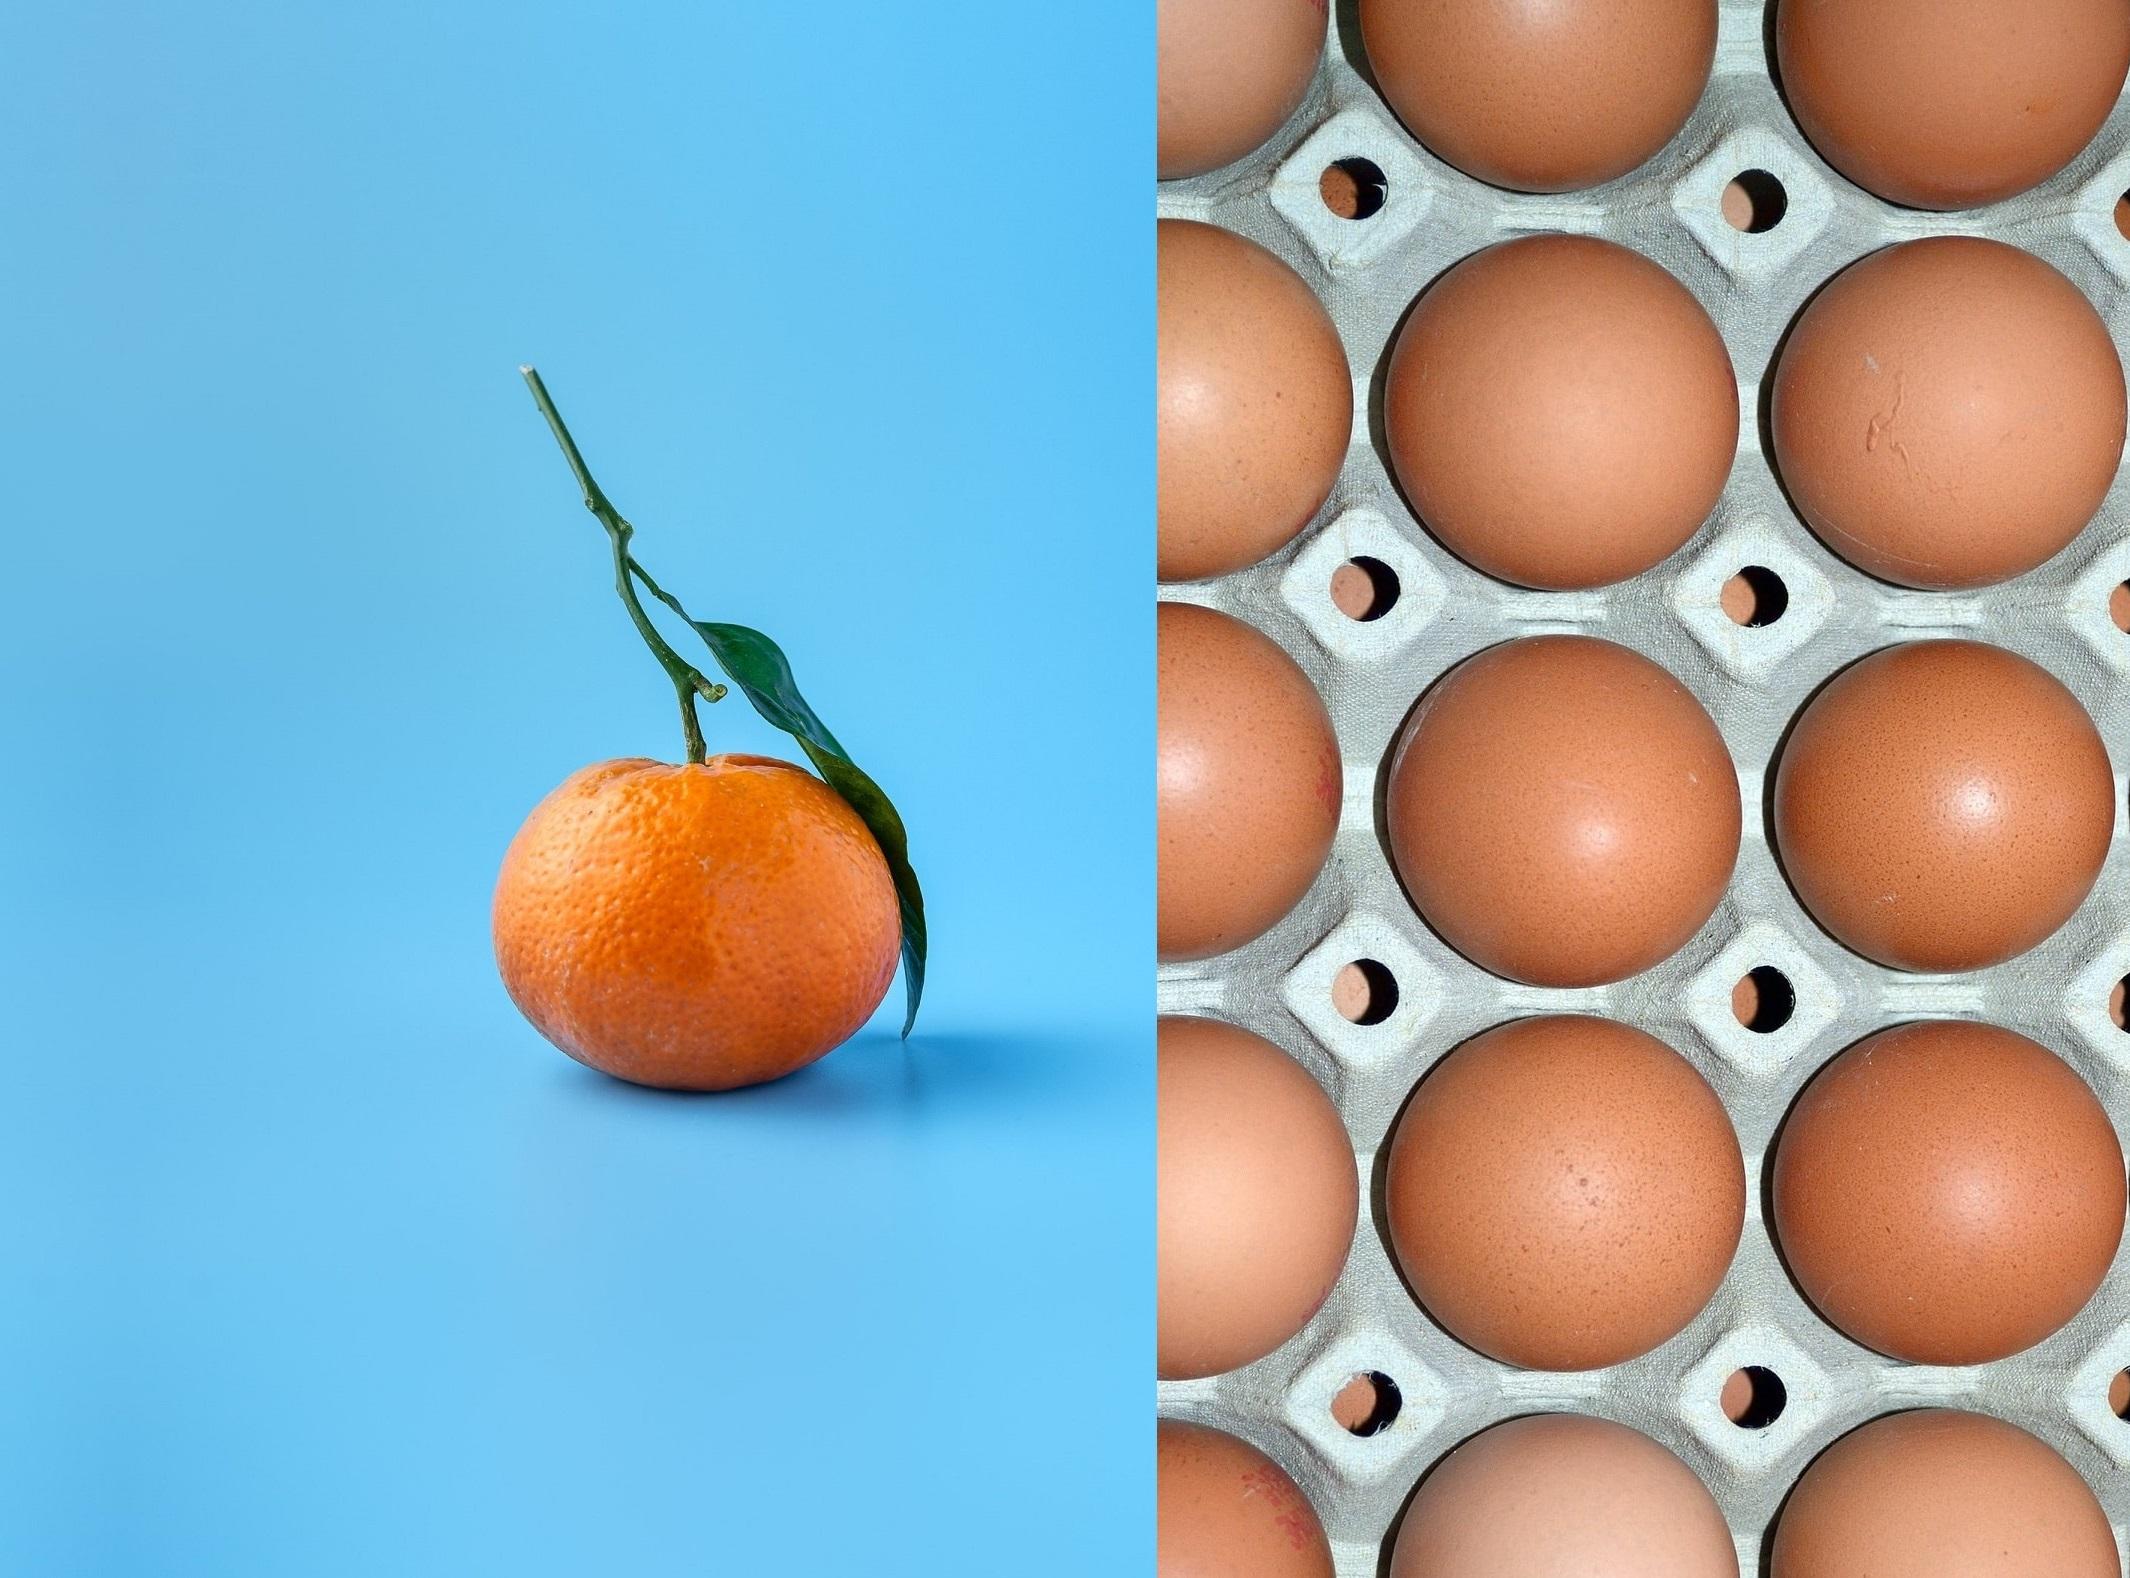 orange-peel-eggshell-mae-mu-szucs-laszlo1